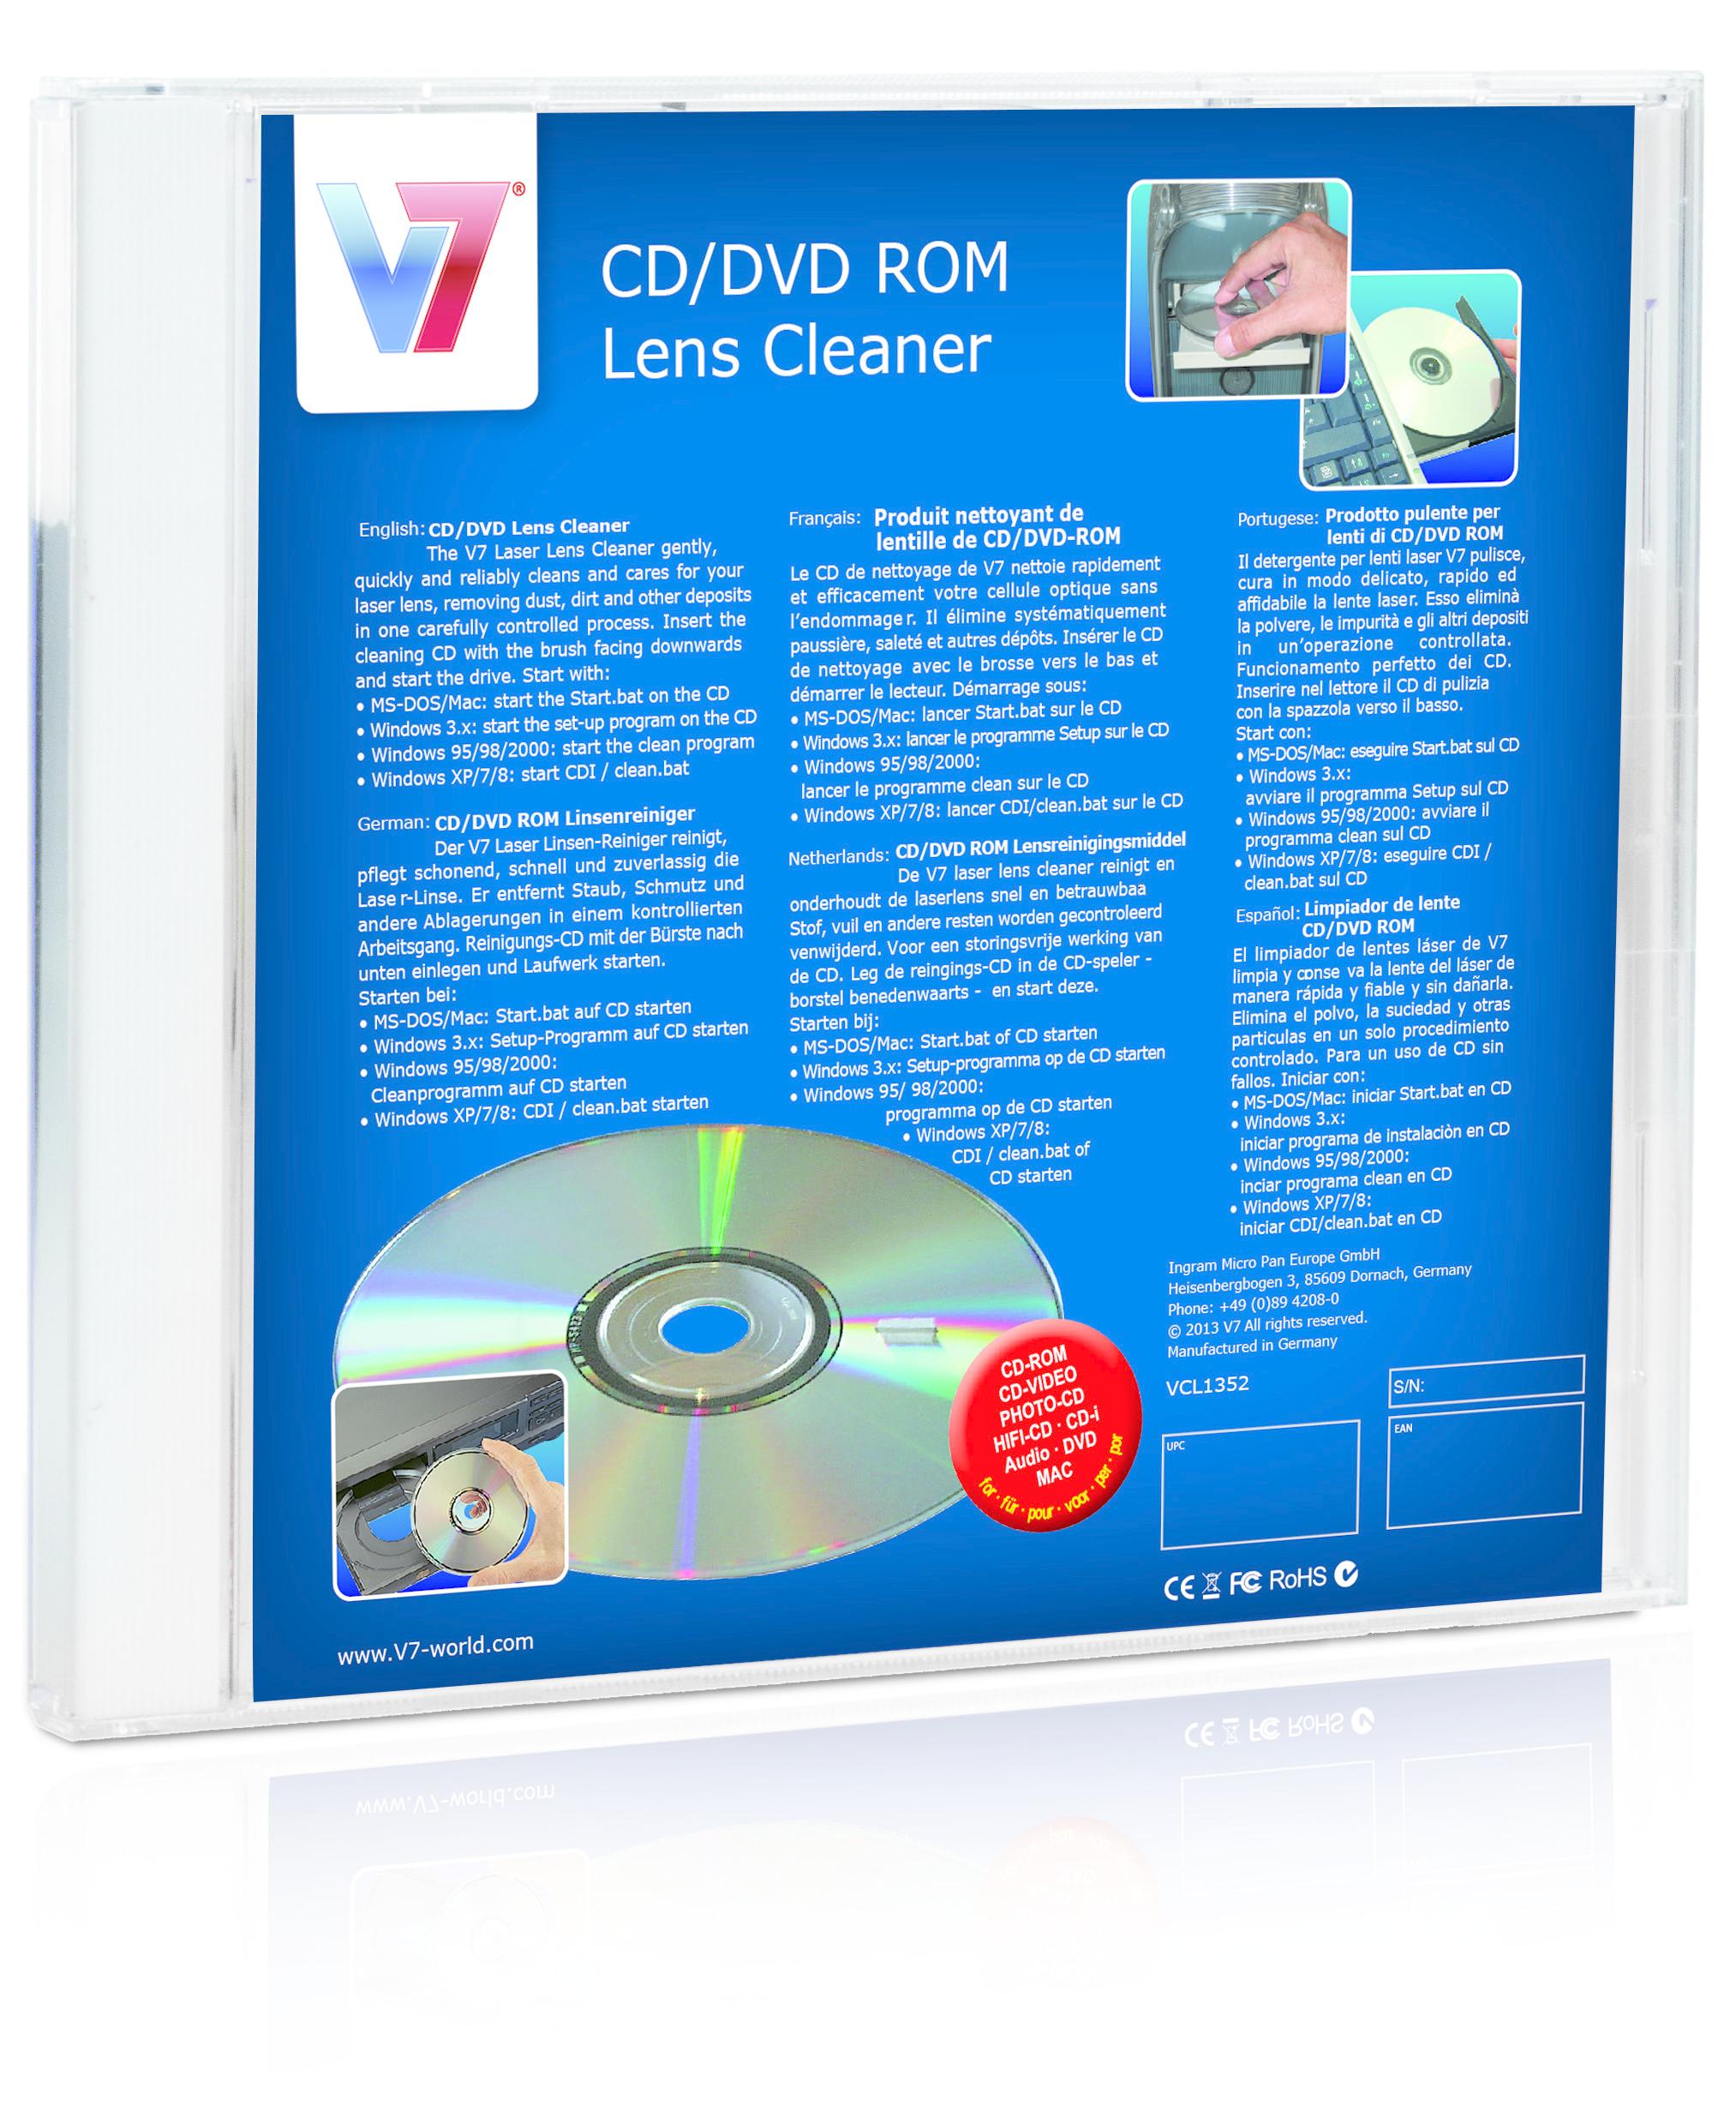 V7 CD/DVD-Linsenreinigungs-Kit